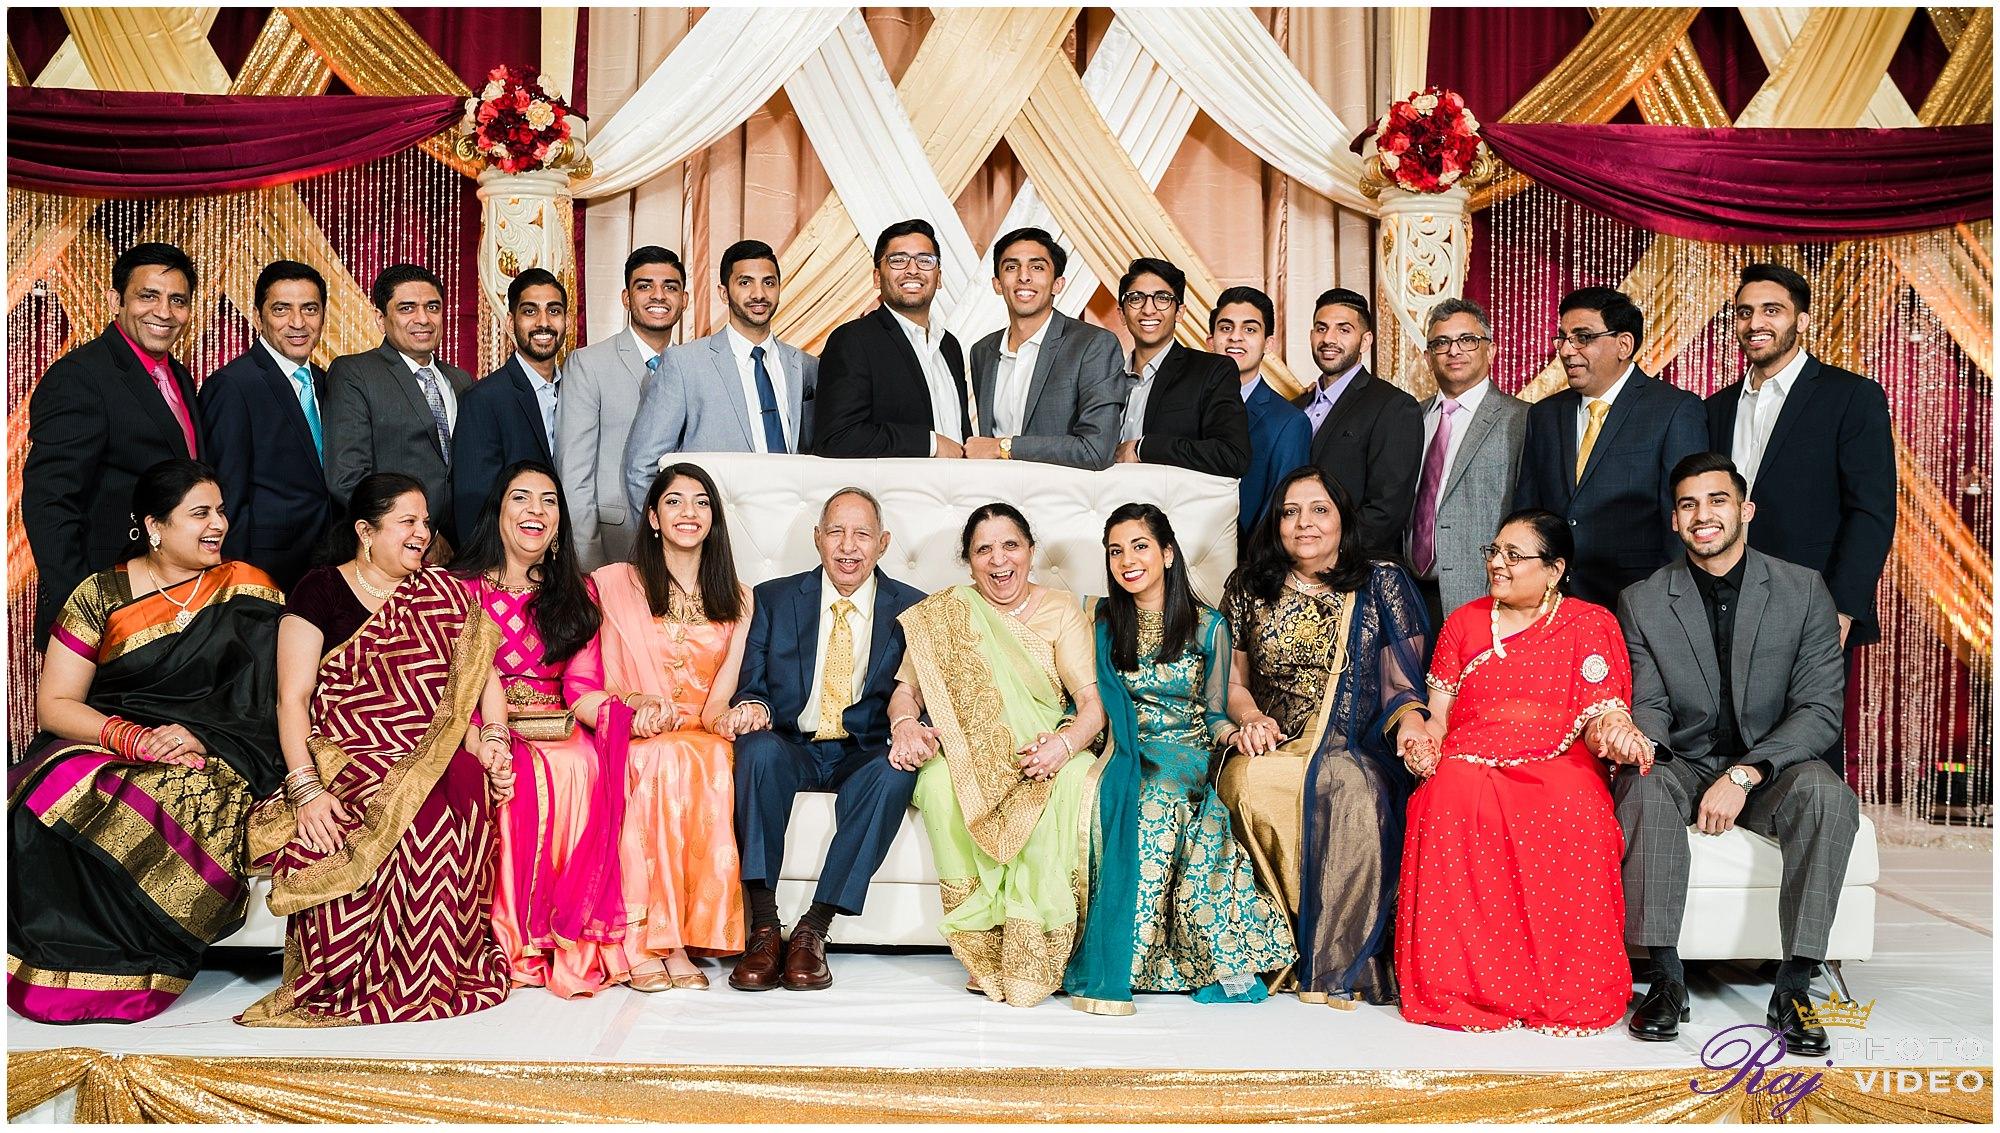 Founders-Inn-and-Spa-Virginia-Beach-VA-Indian-Wedding-Harini-Vivek-92.jpg